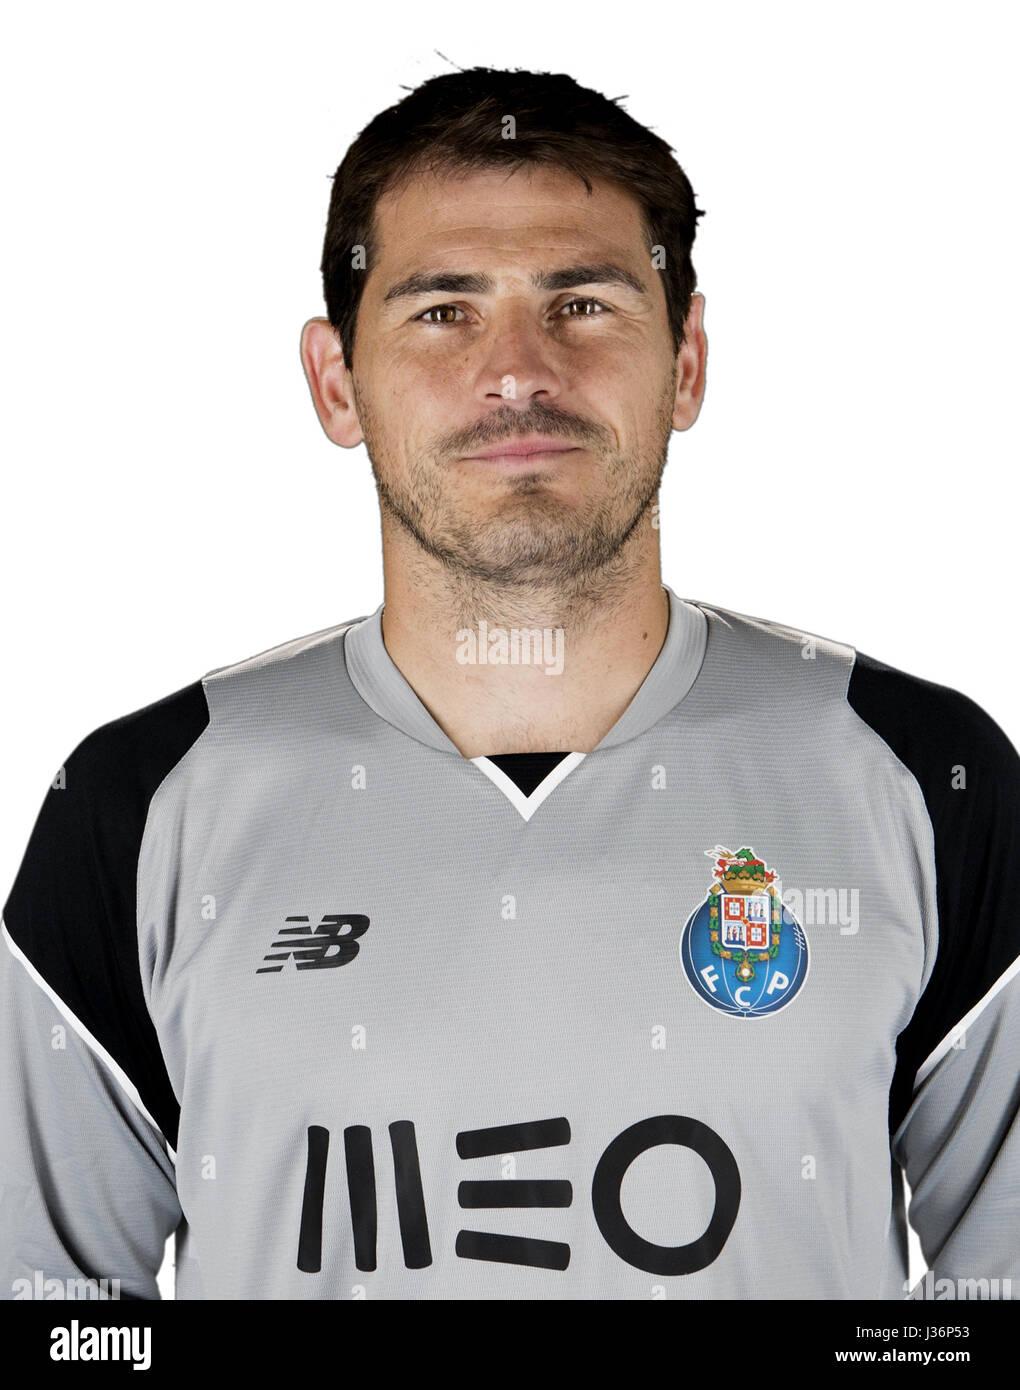 e5ca6f075bf Portugal - Primera Liga NOS 2016-2017 / ( FC Porto ) - Iker Casillas  Fernandez